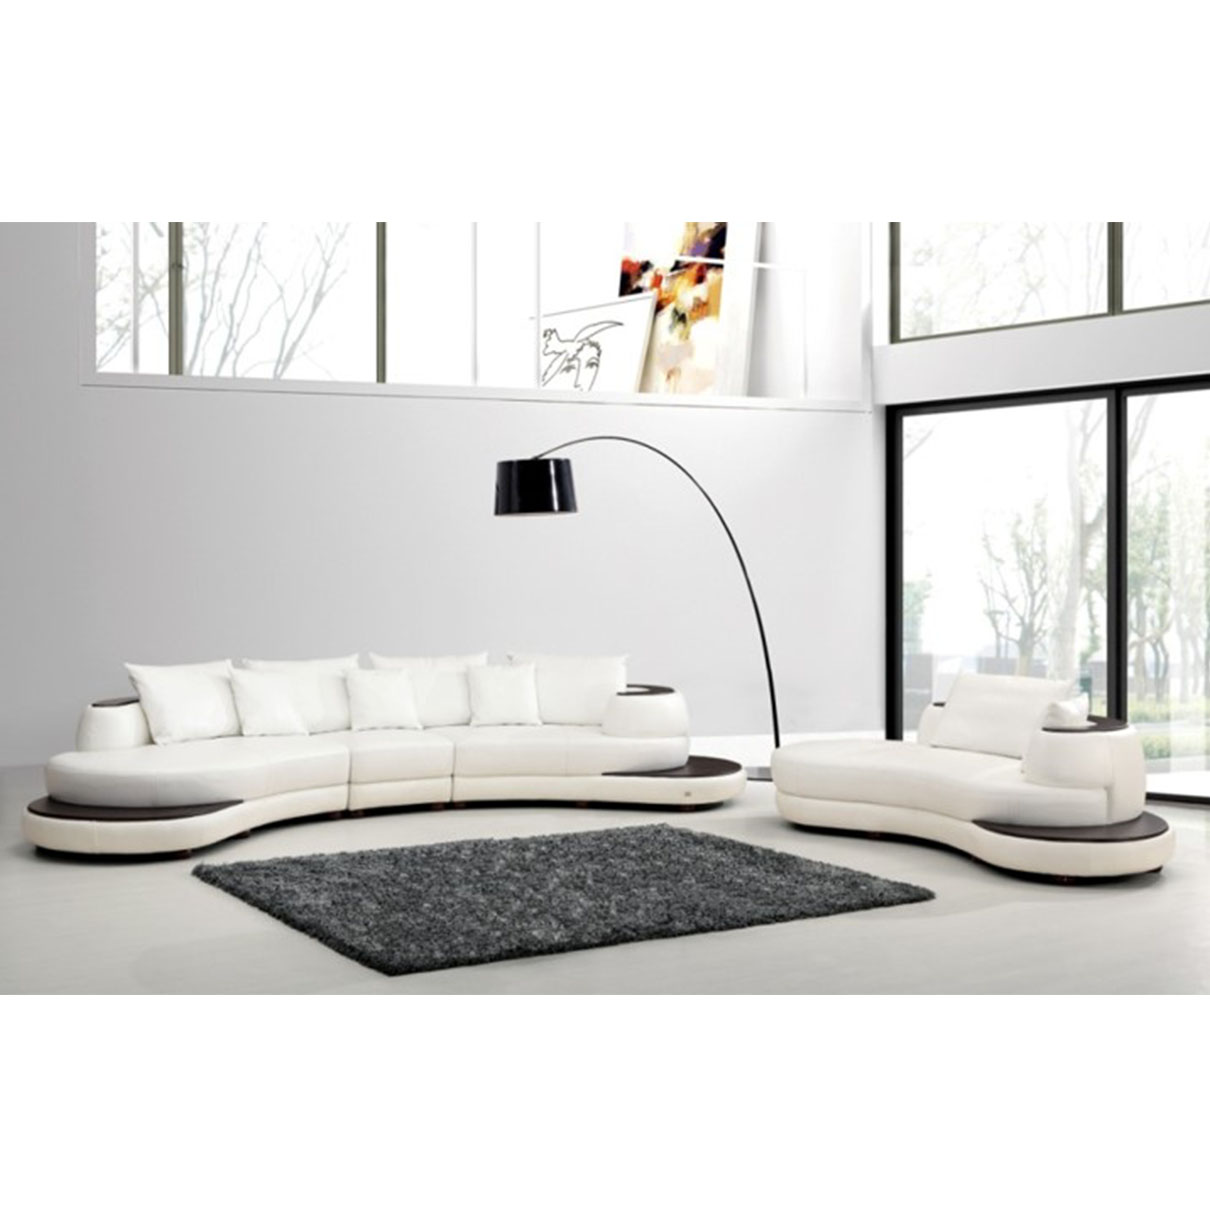 belinda decor and design lounge